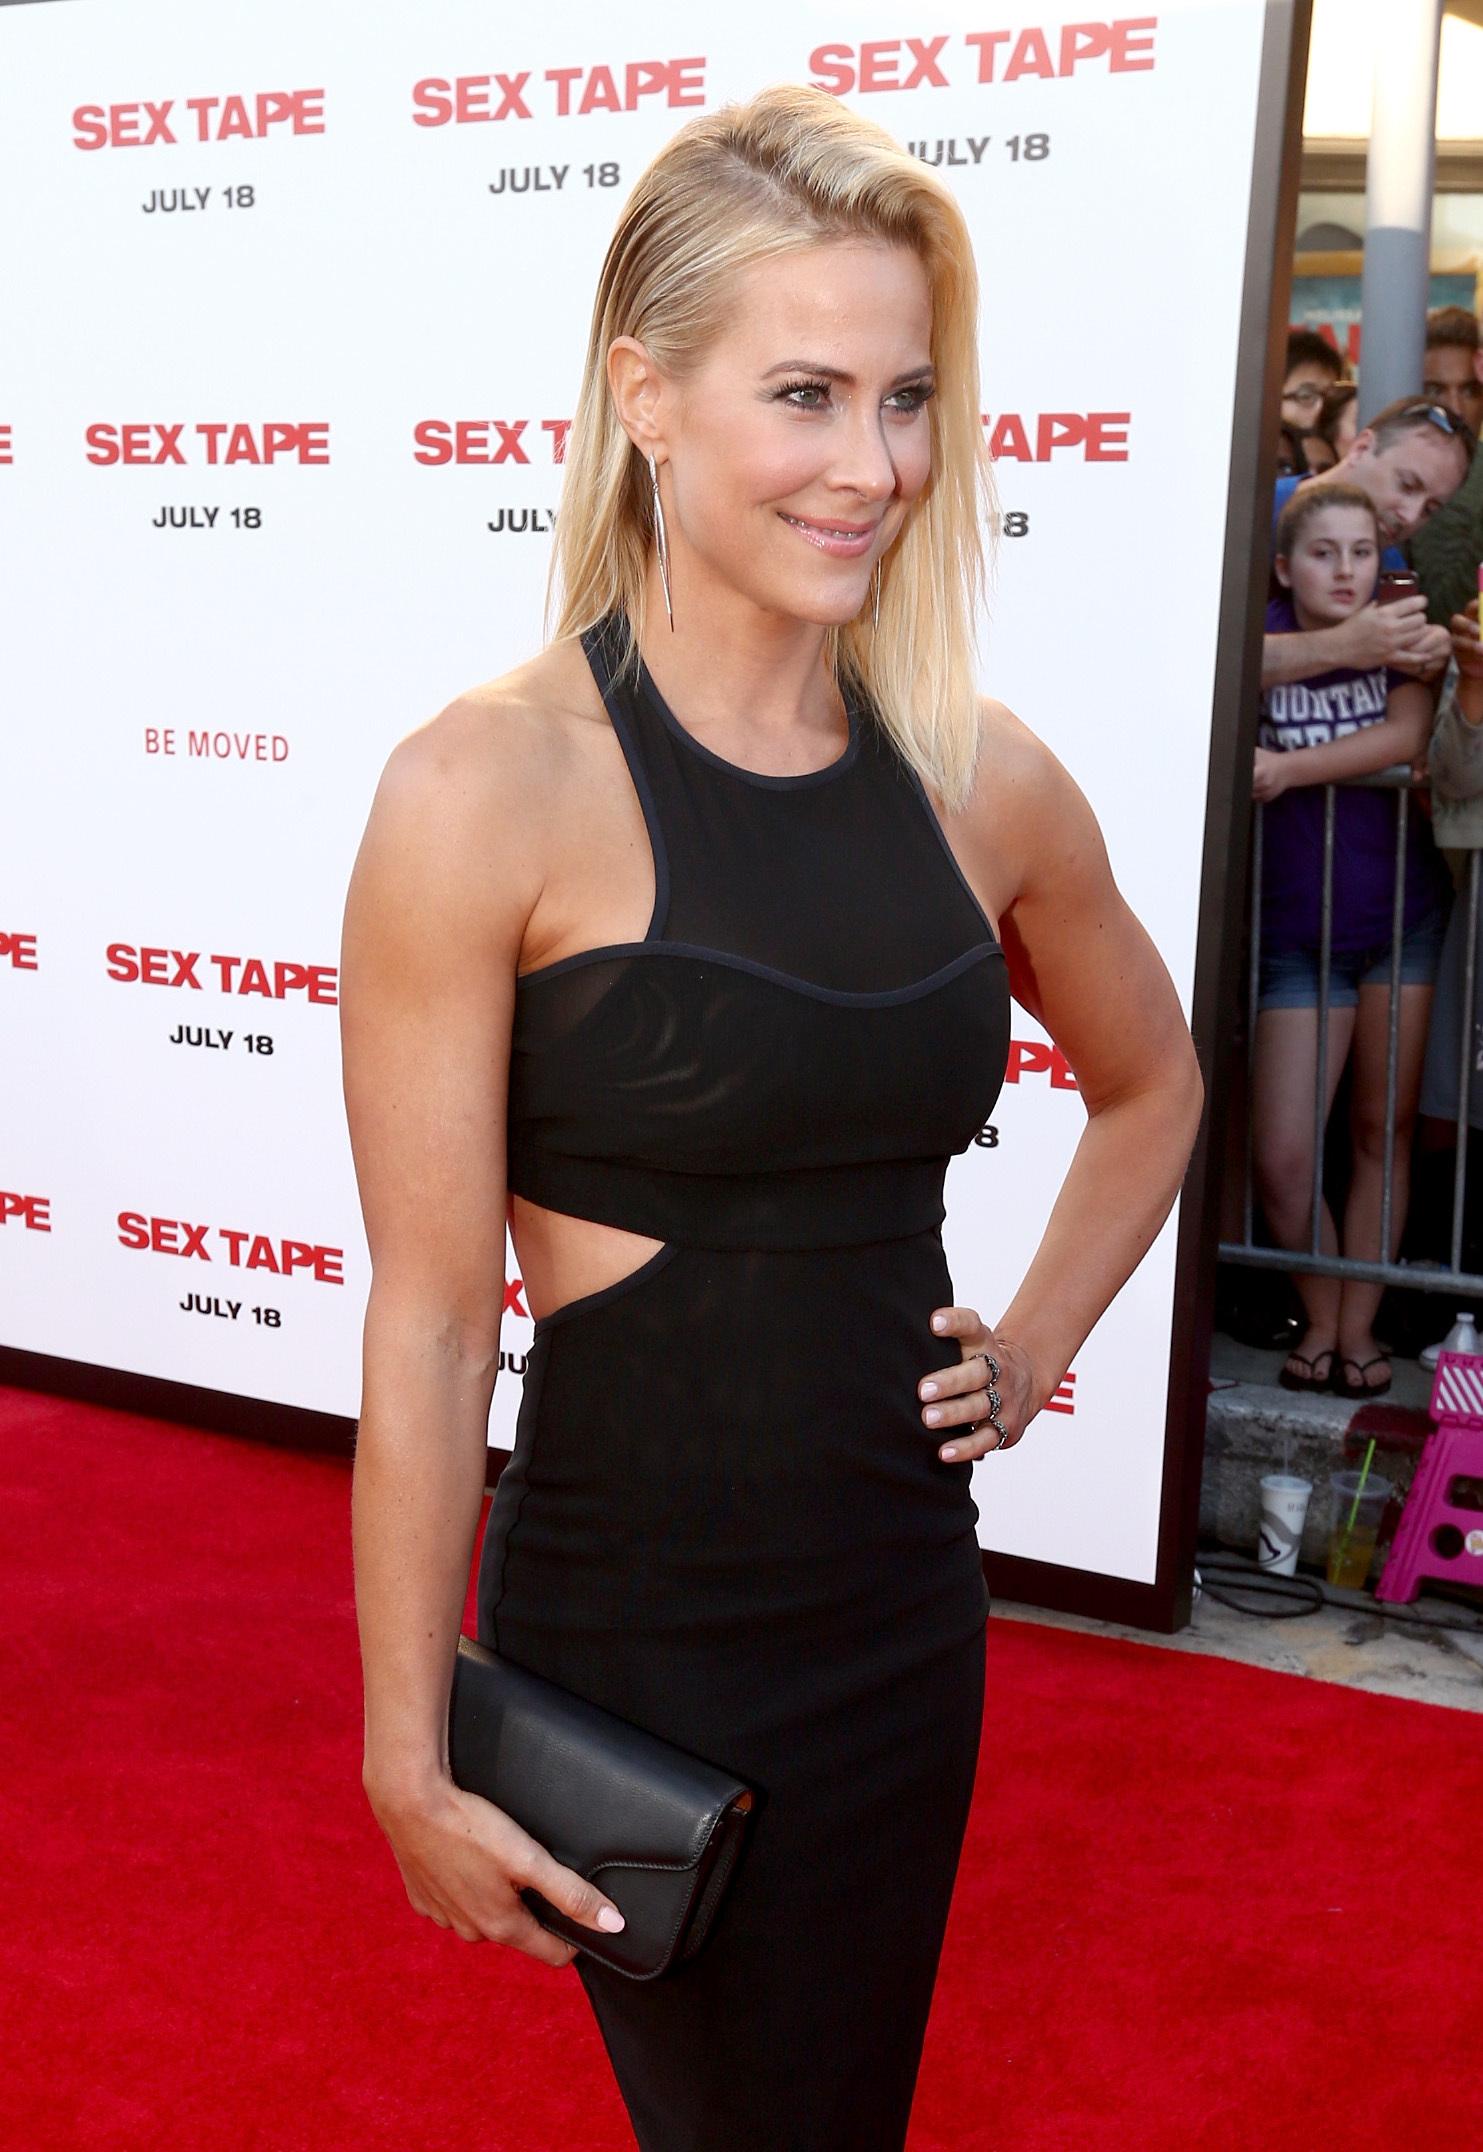 Brittany Daniel Sex Tape premiere in Westwood